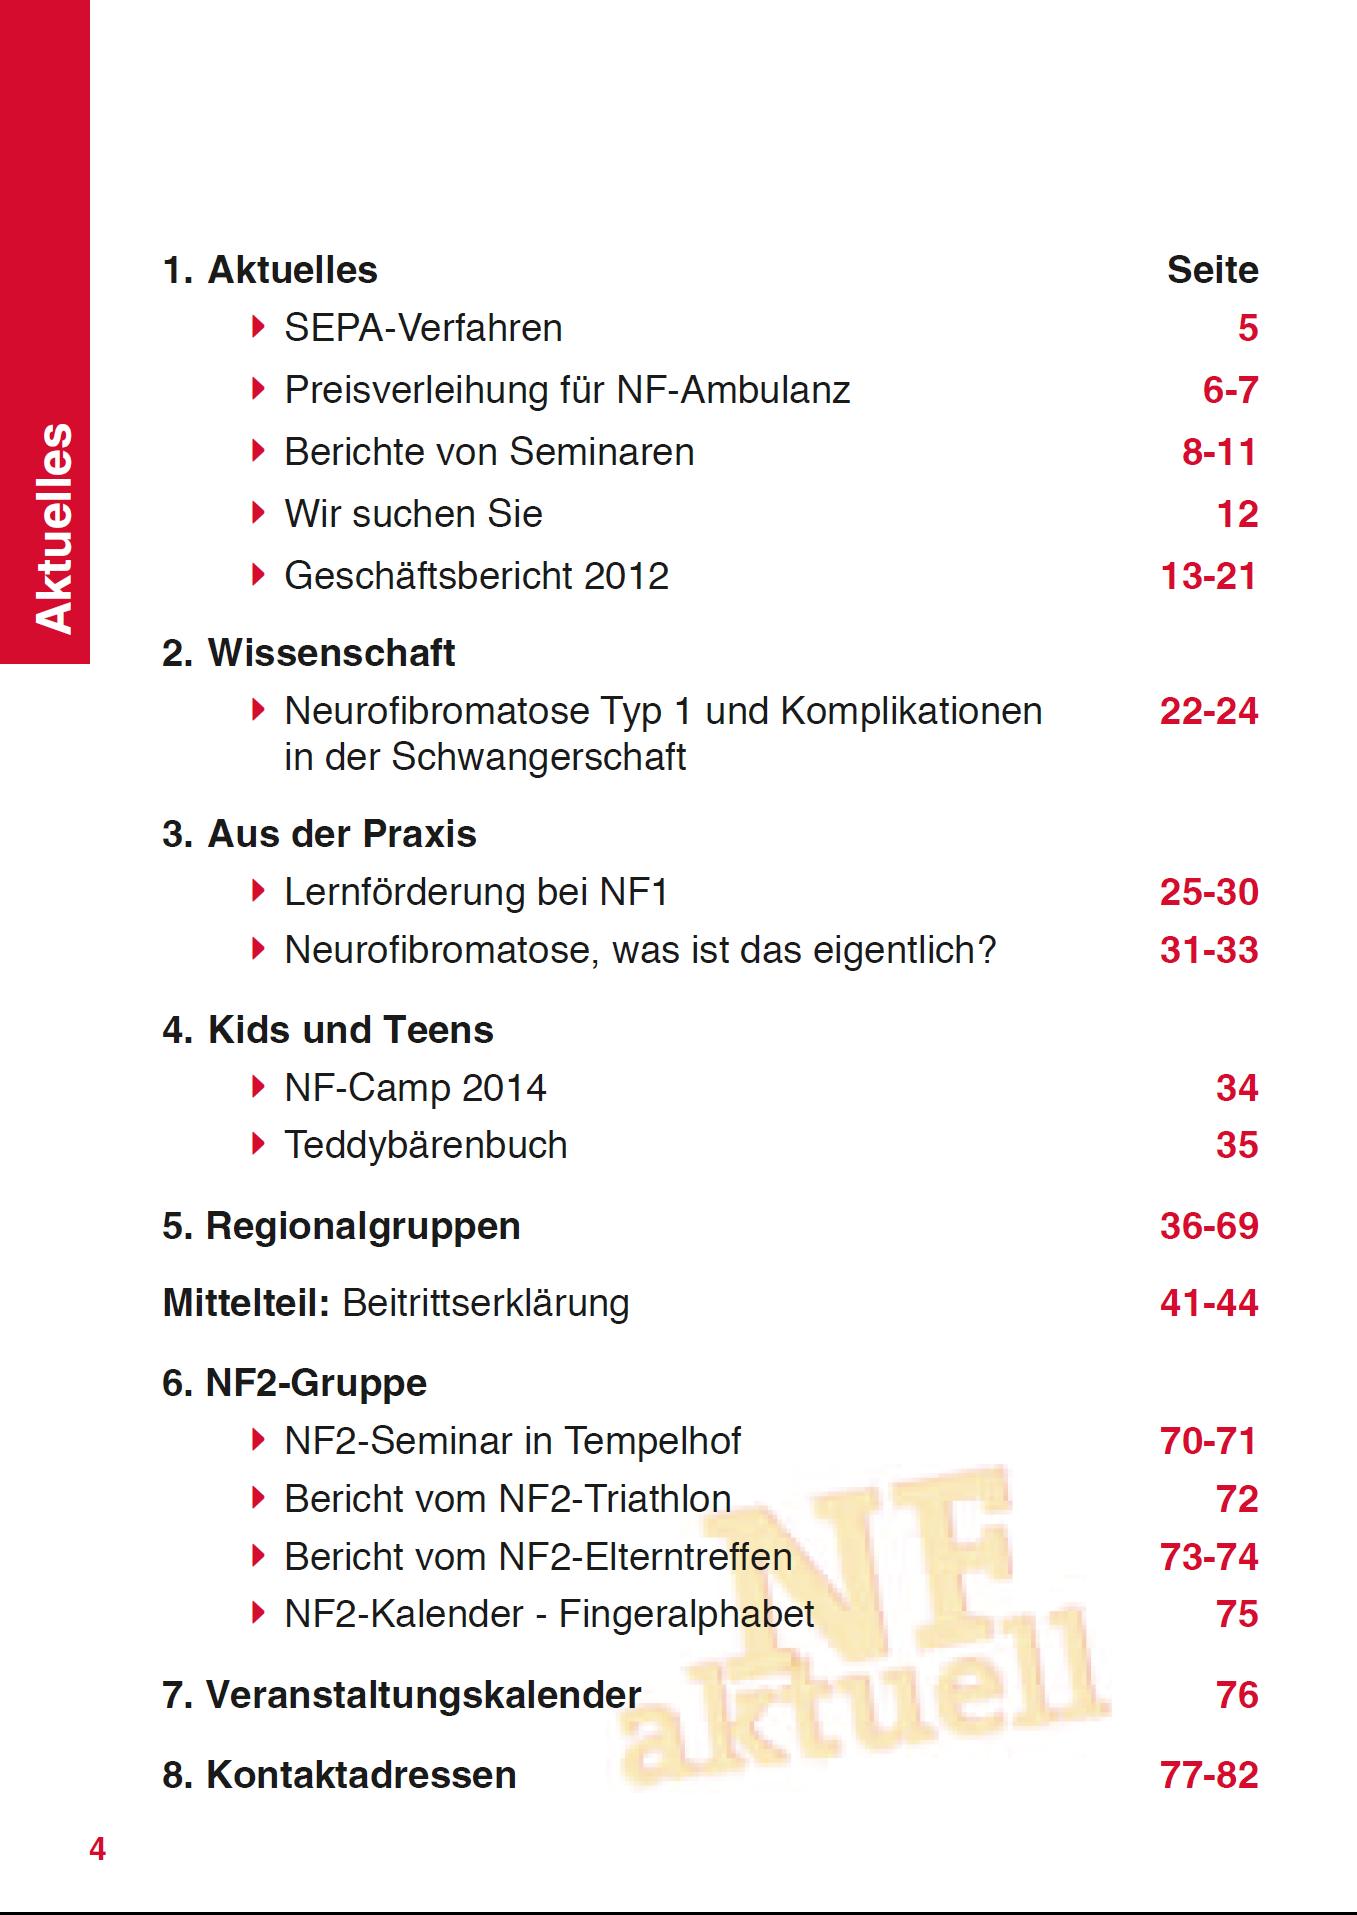 NFaktuell-87-dezember-2013-inhalt